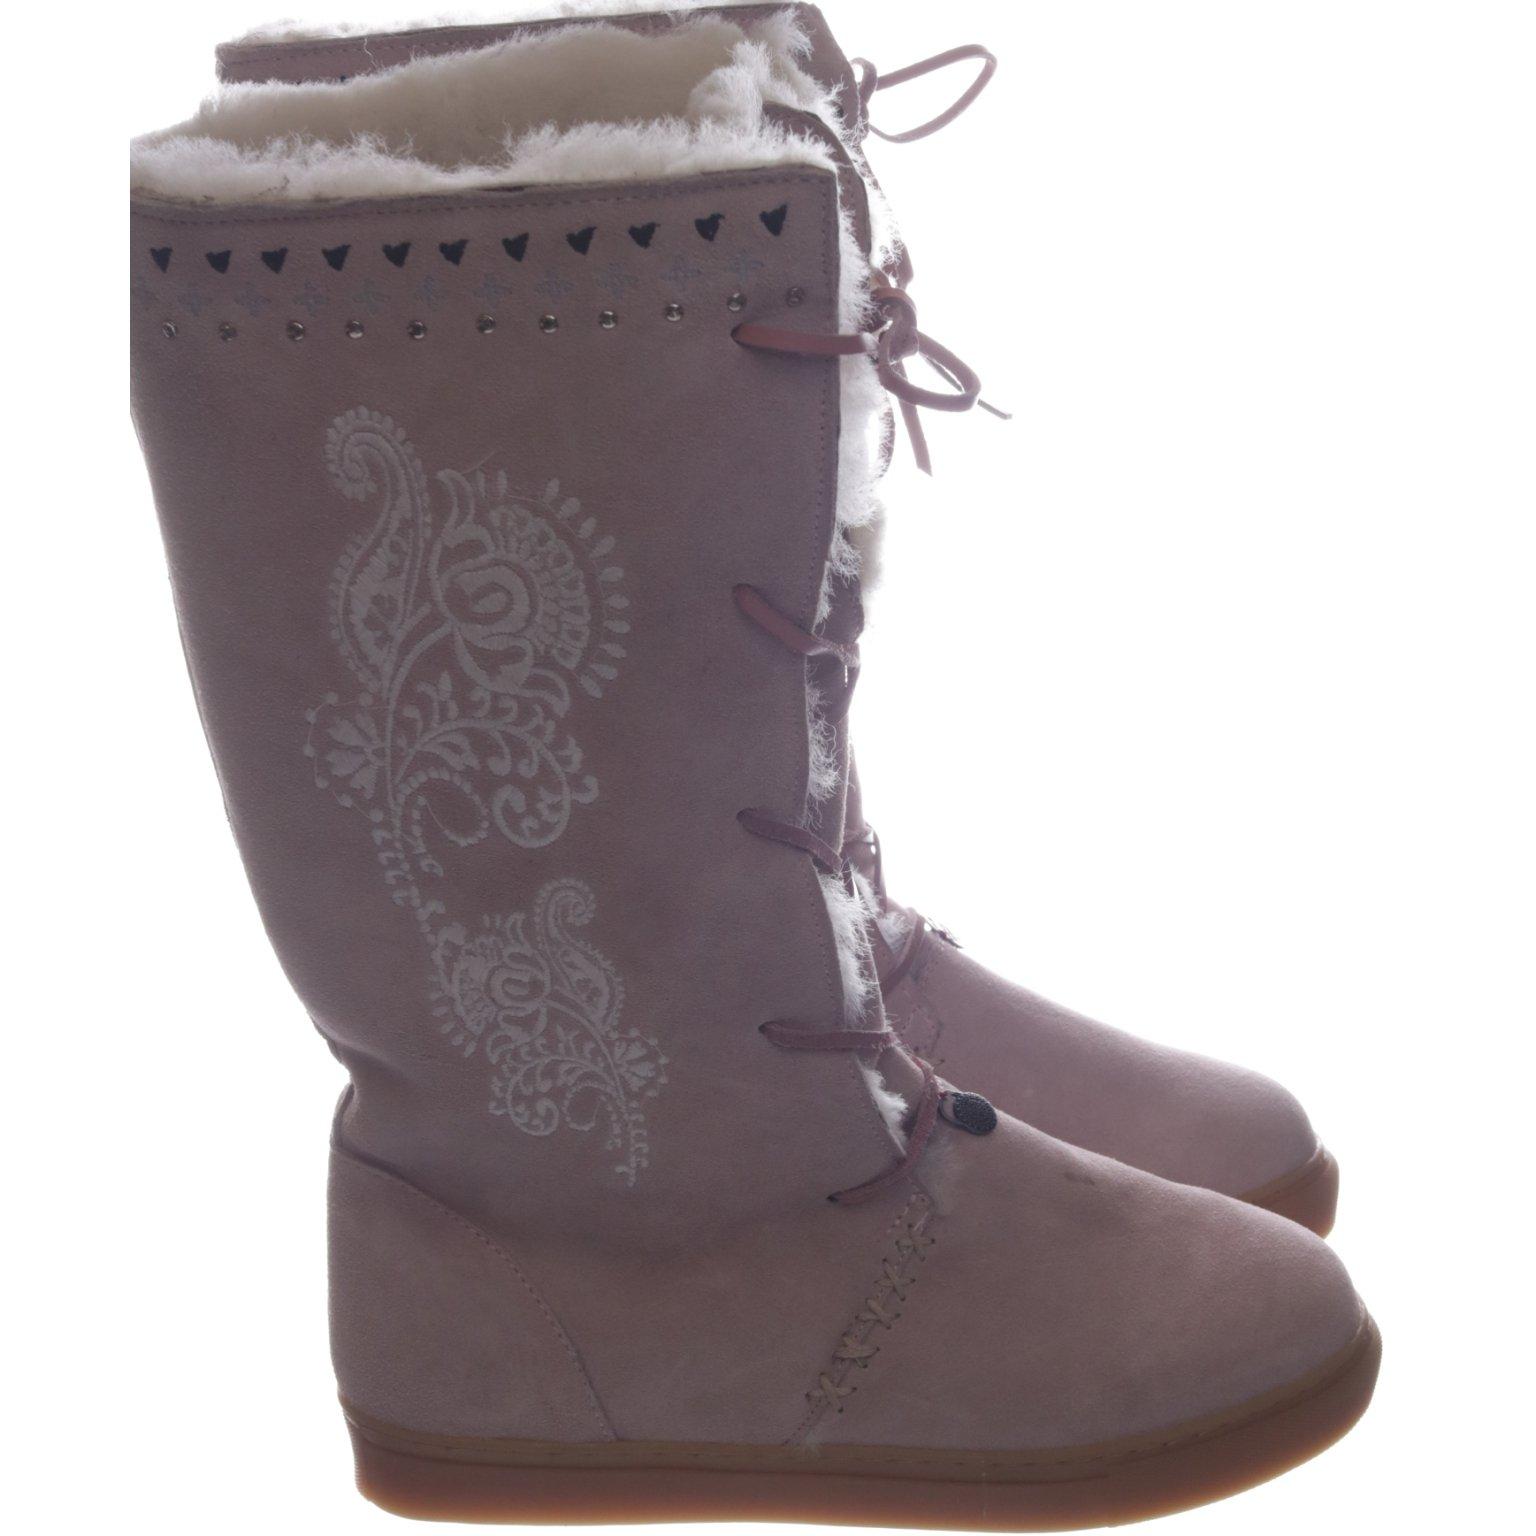 Odd Molly, Boots, Strl: 40, Rosa, Mocka (422993801) ᐈ